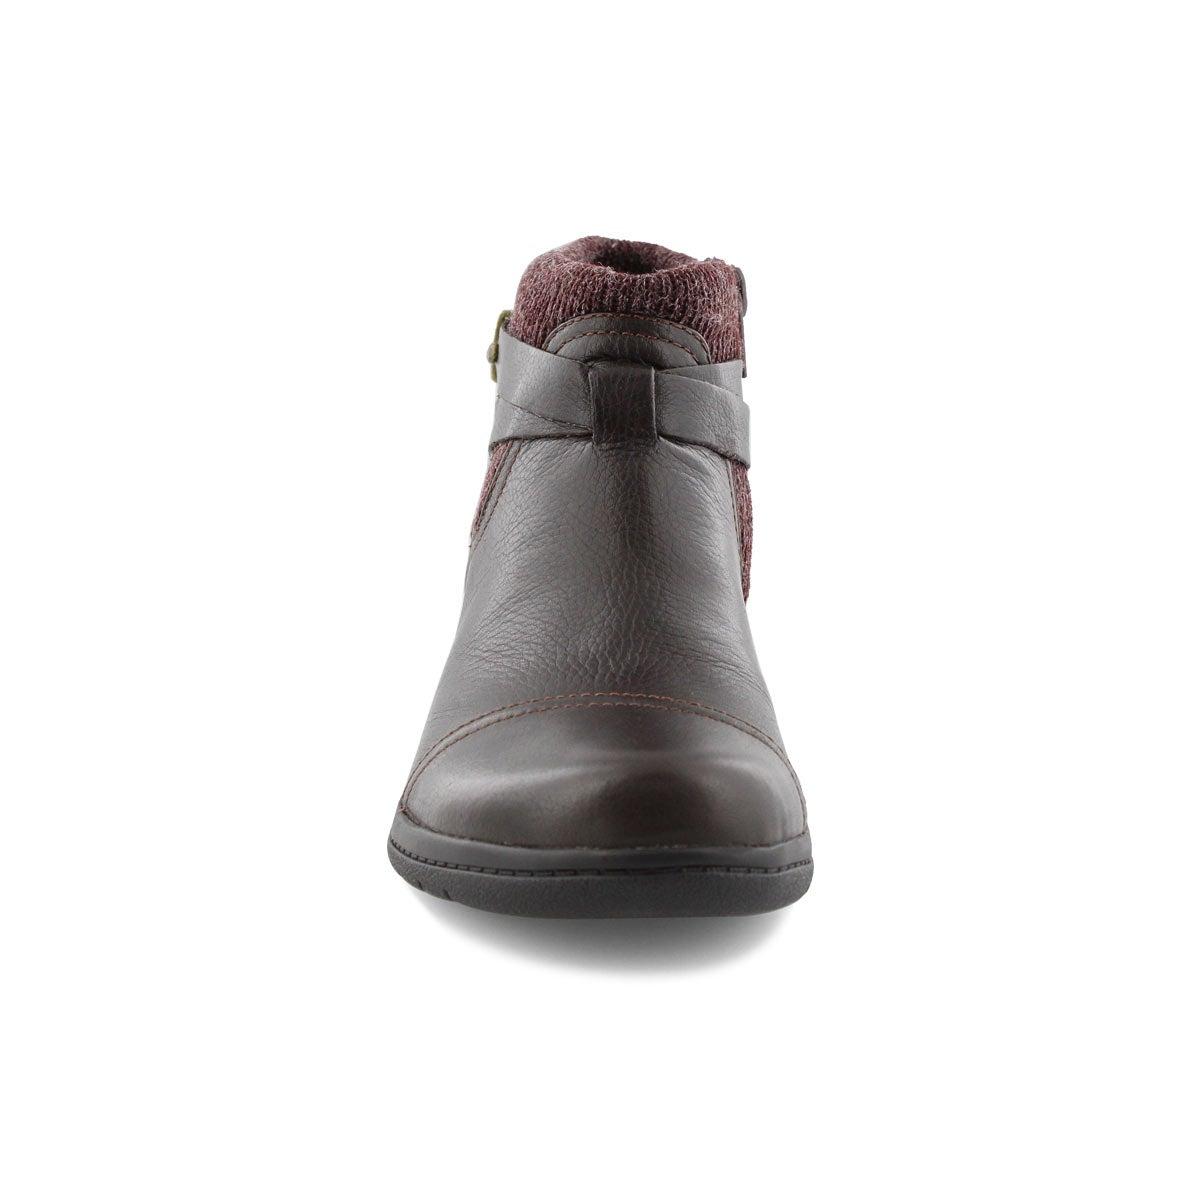 Lds Cheyn Kisha dk brn casual ankle boot